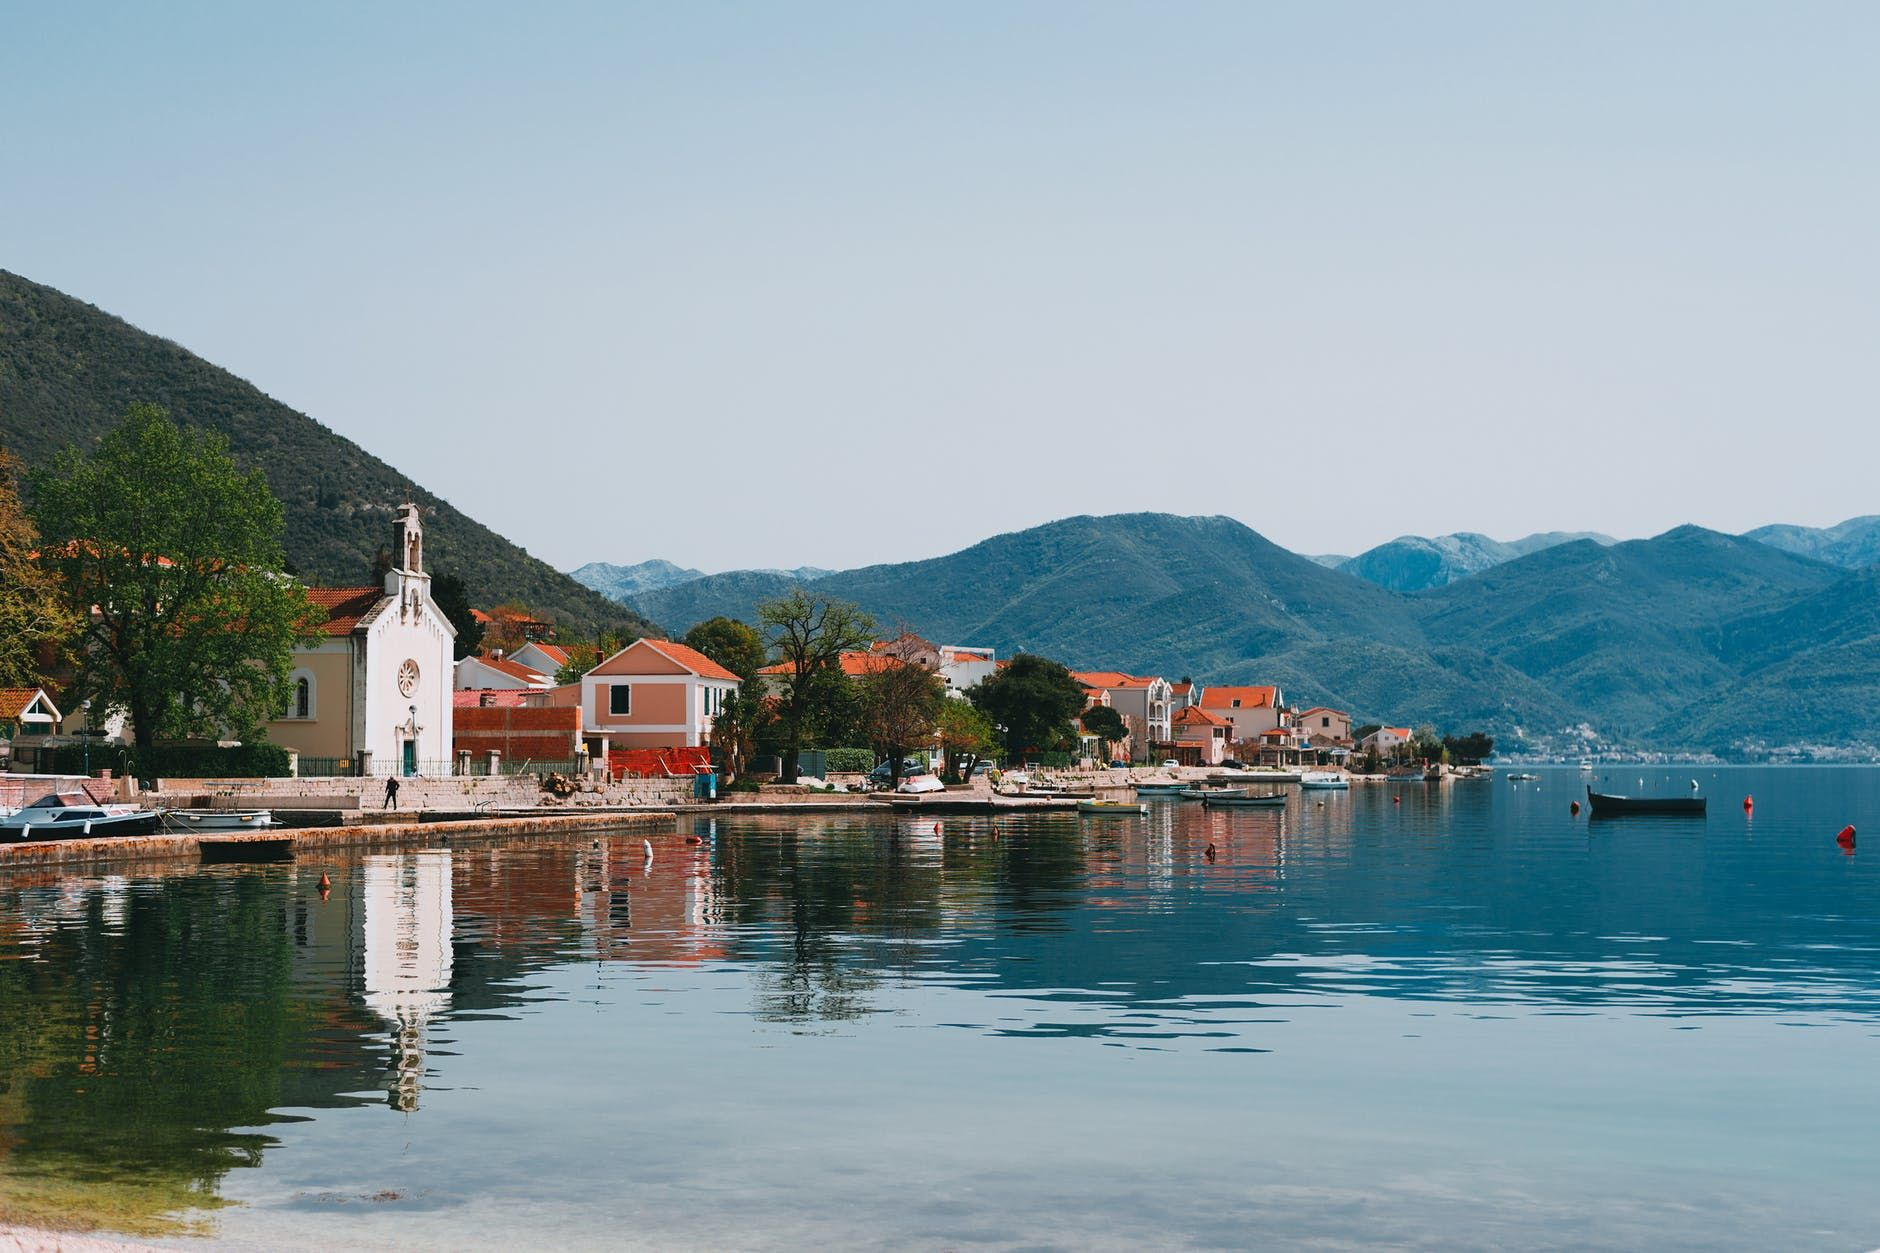 coastal village on peaceful hilly lake shore